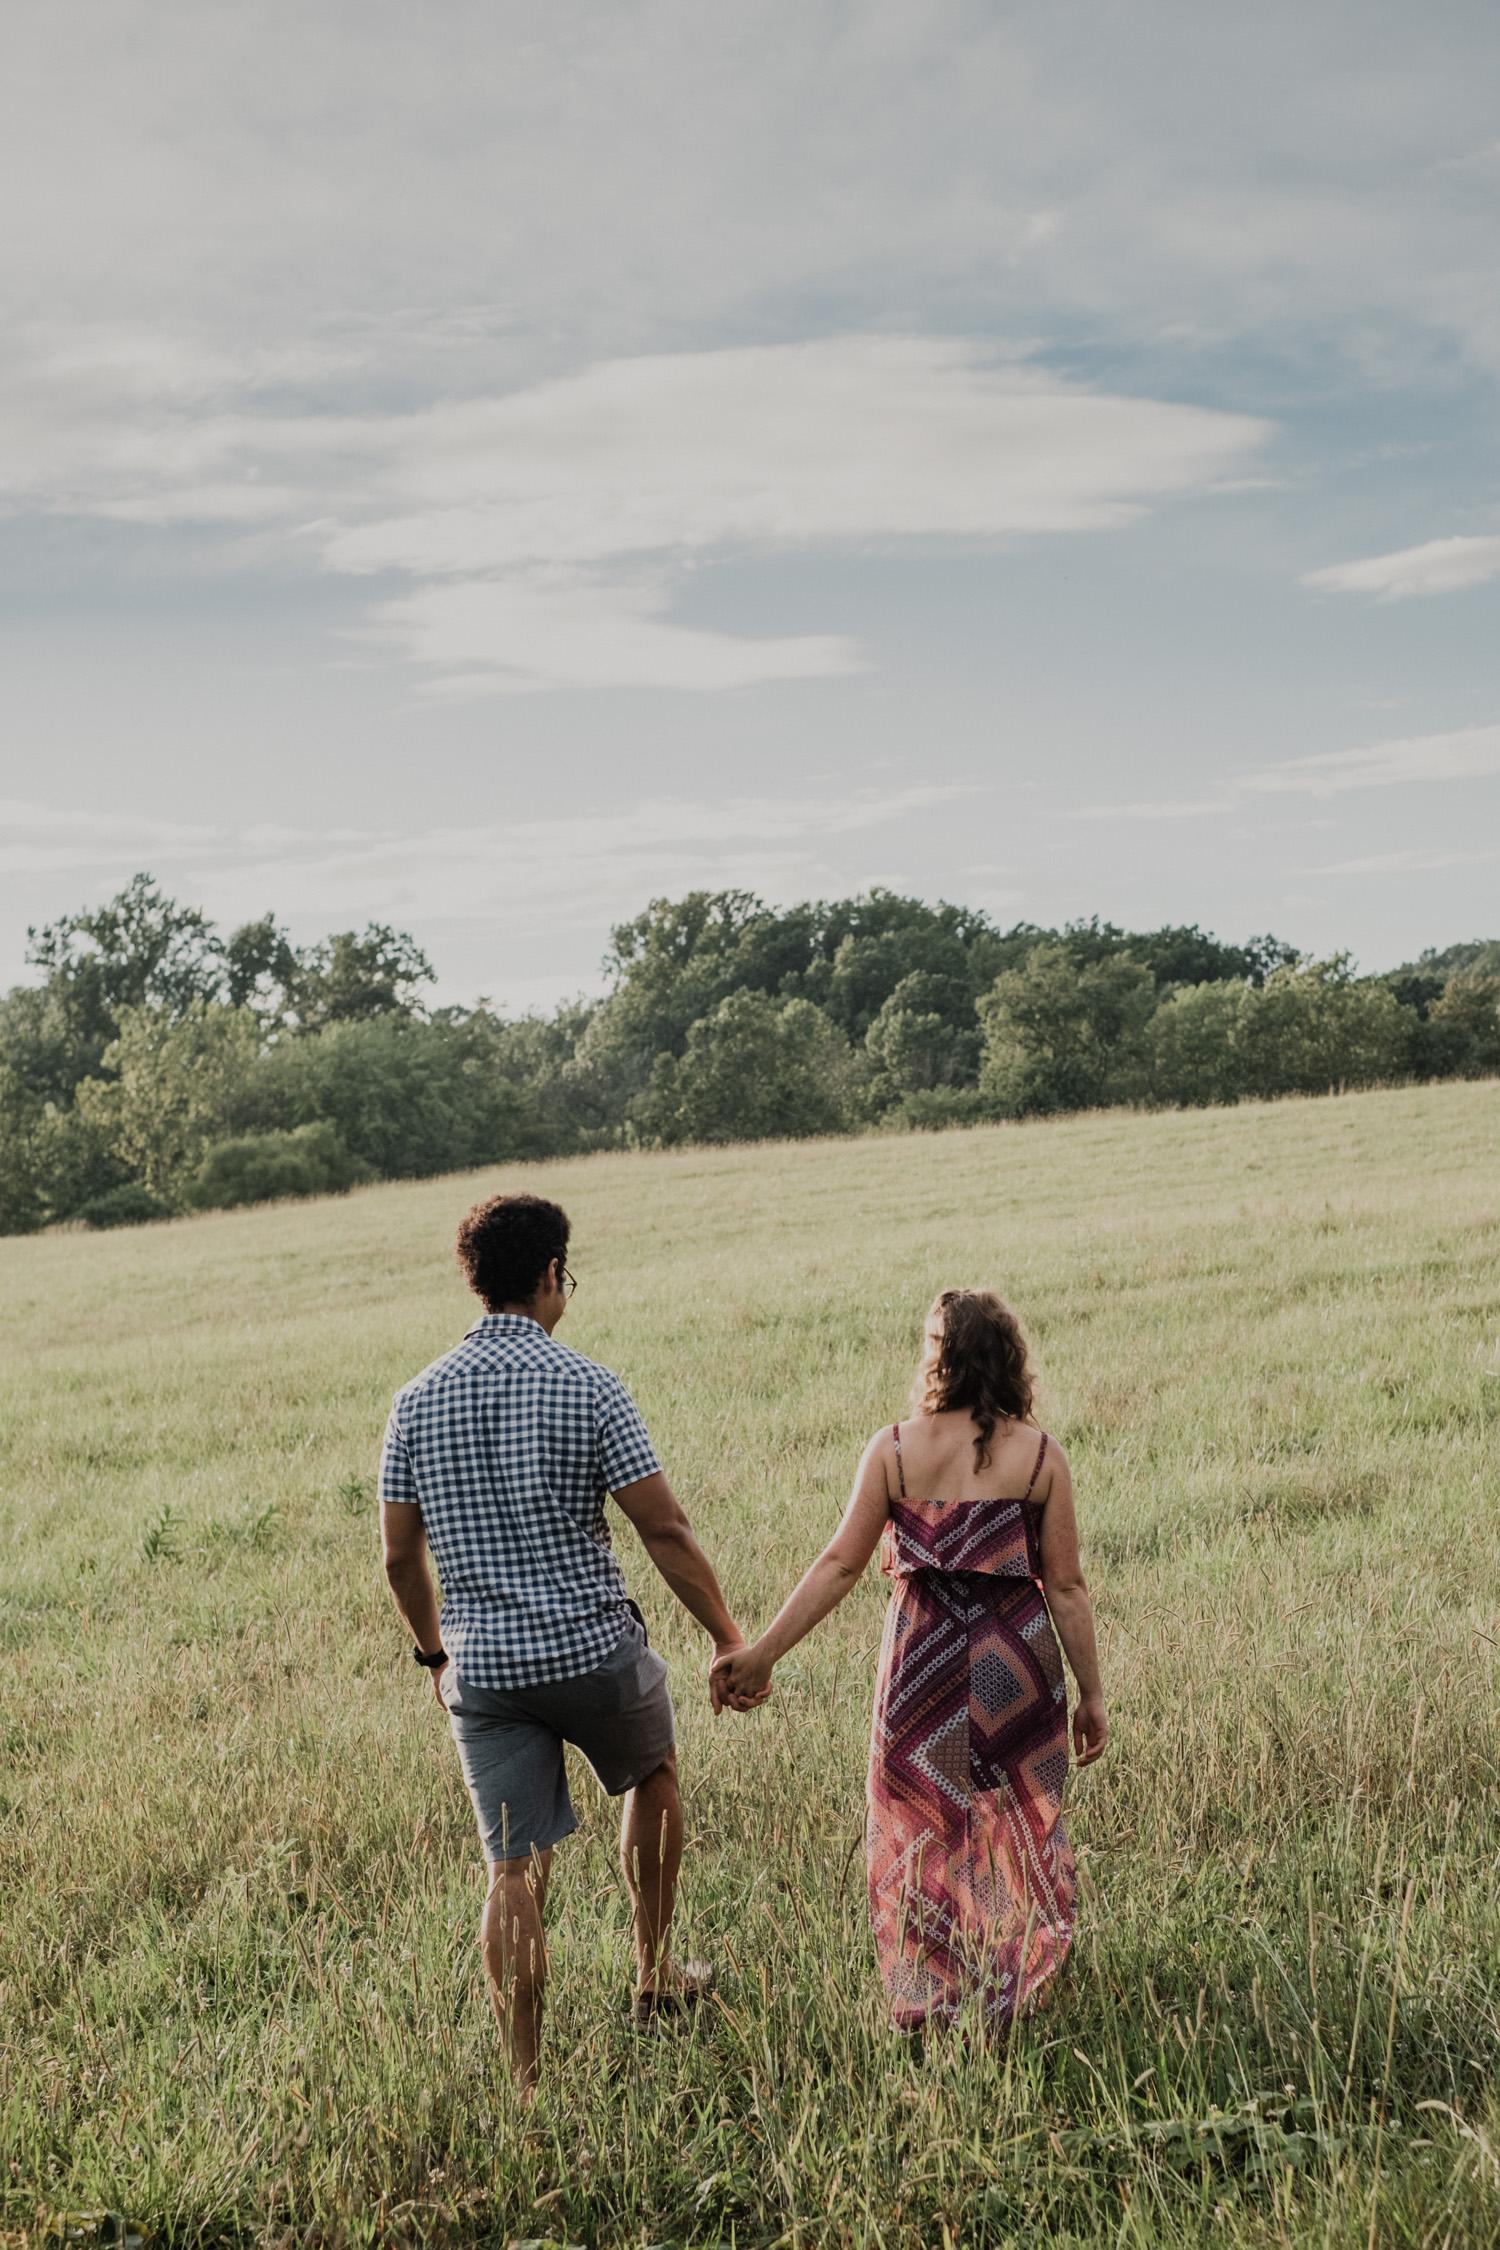 Couple walks away through a field at a park